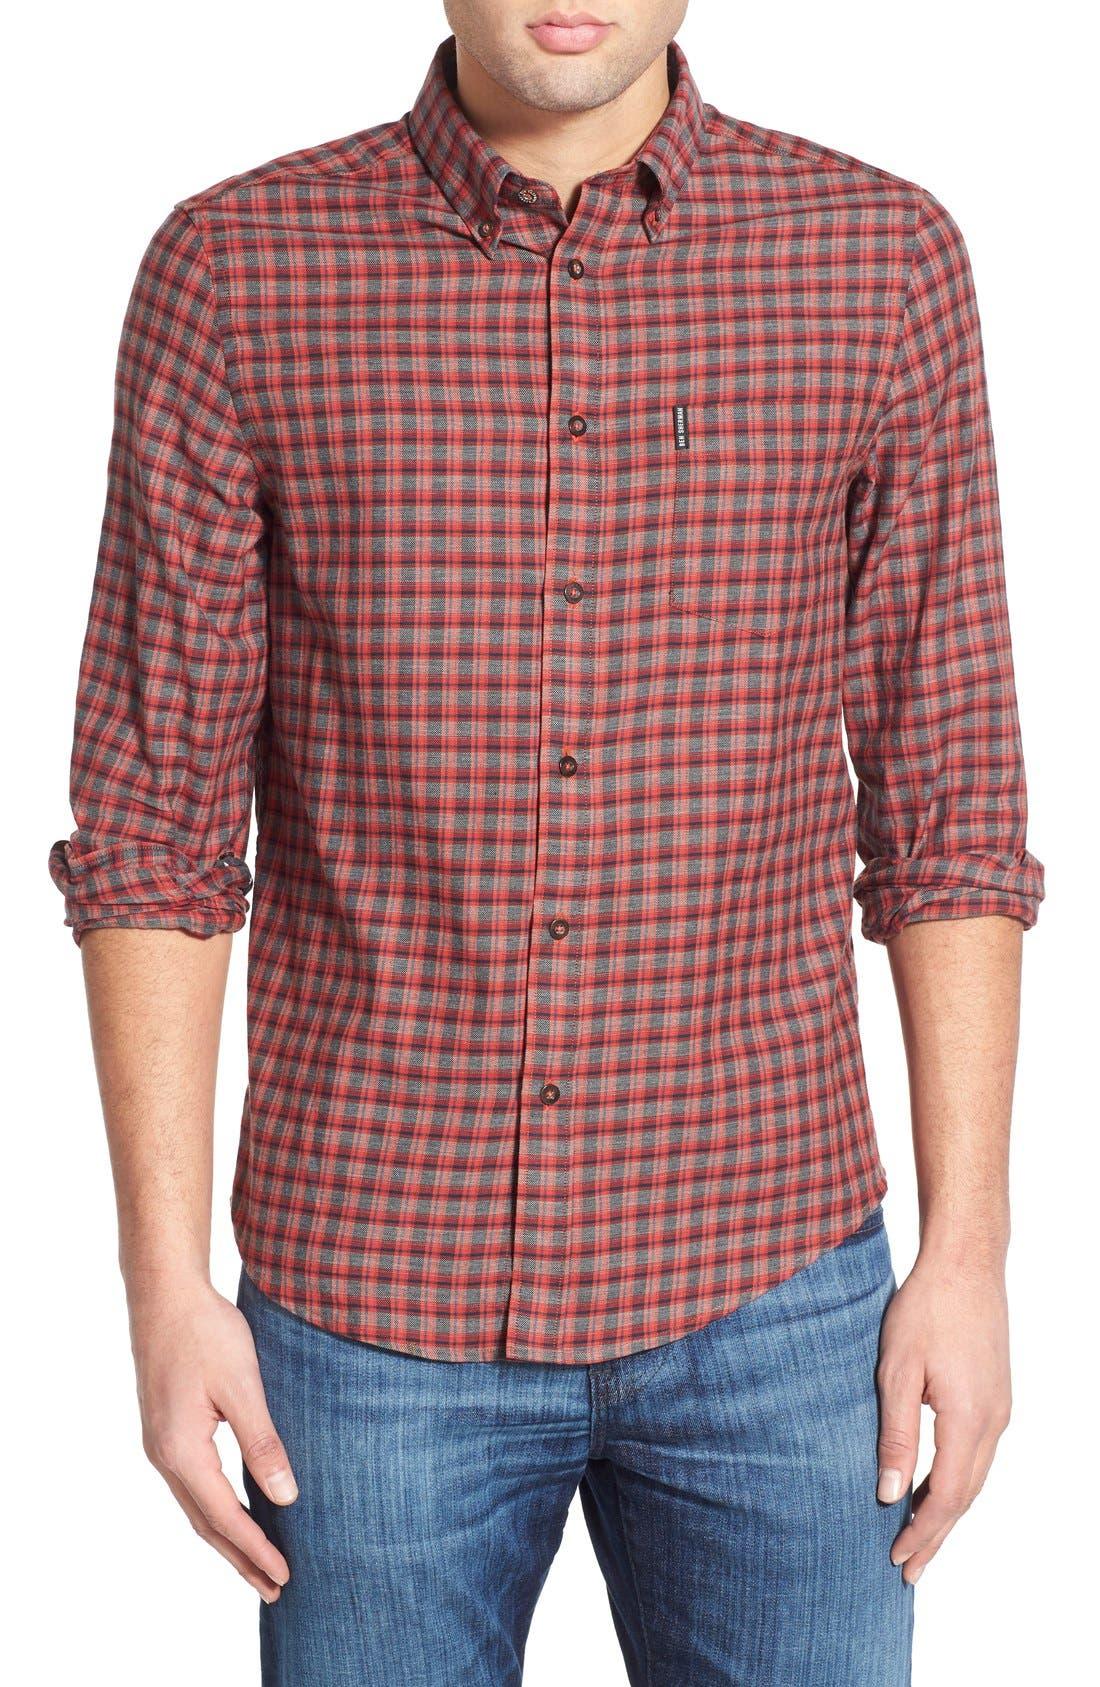 Alternate Image 1 Selected - Ben Sherman Mod Fit Tartan Plaid Sport Shirt